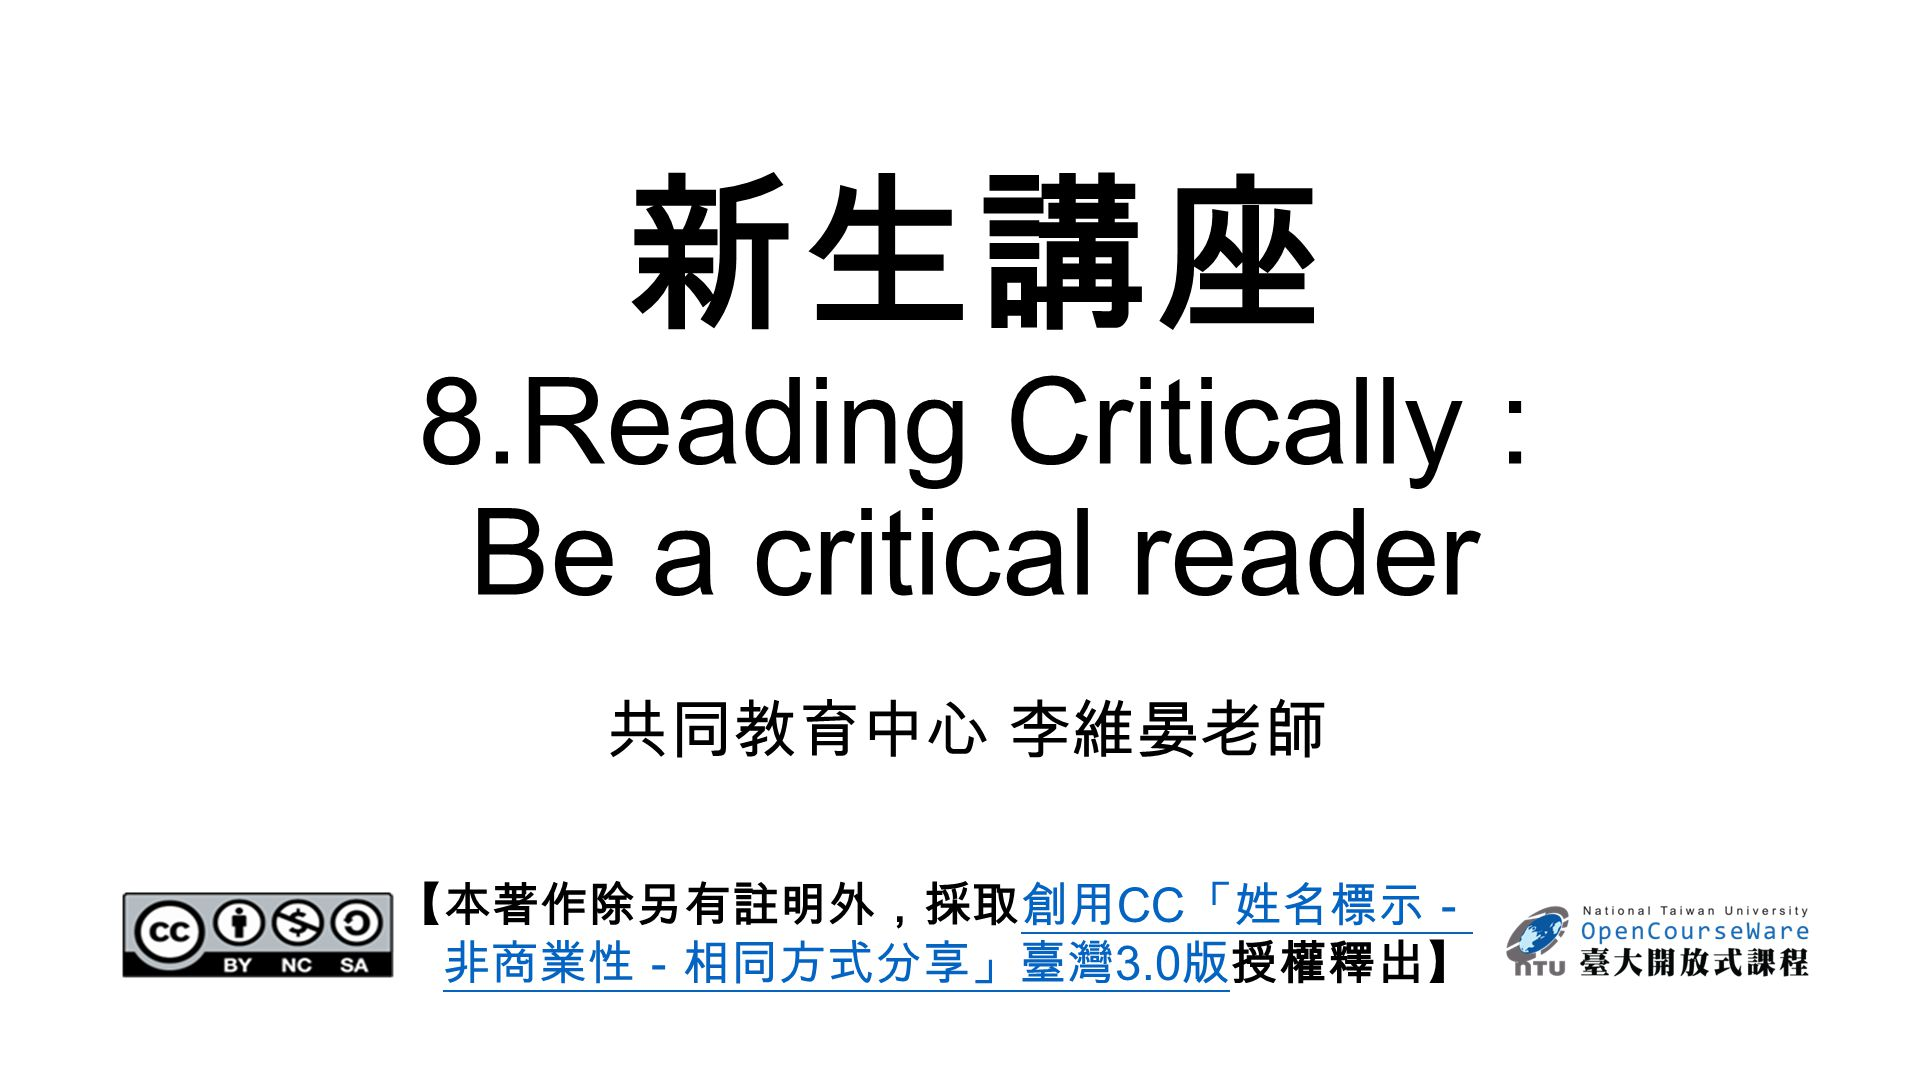 新生講座 8.Reading Critically : Be a critical reader